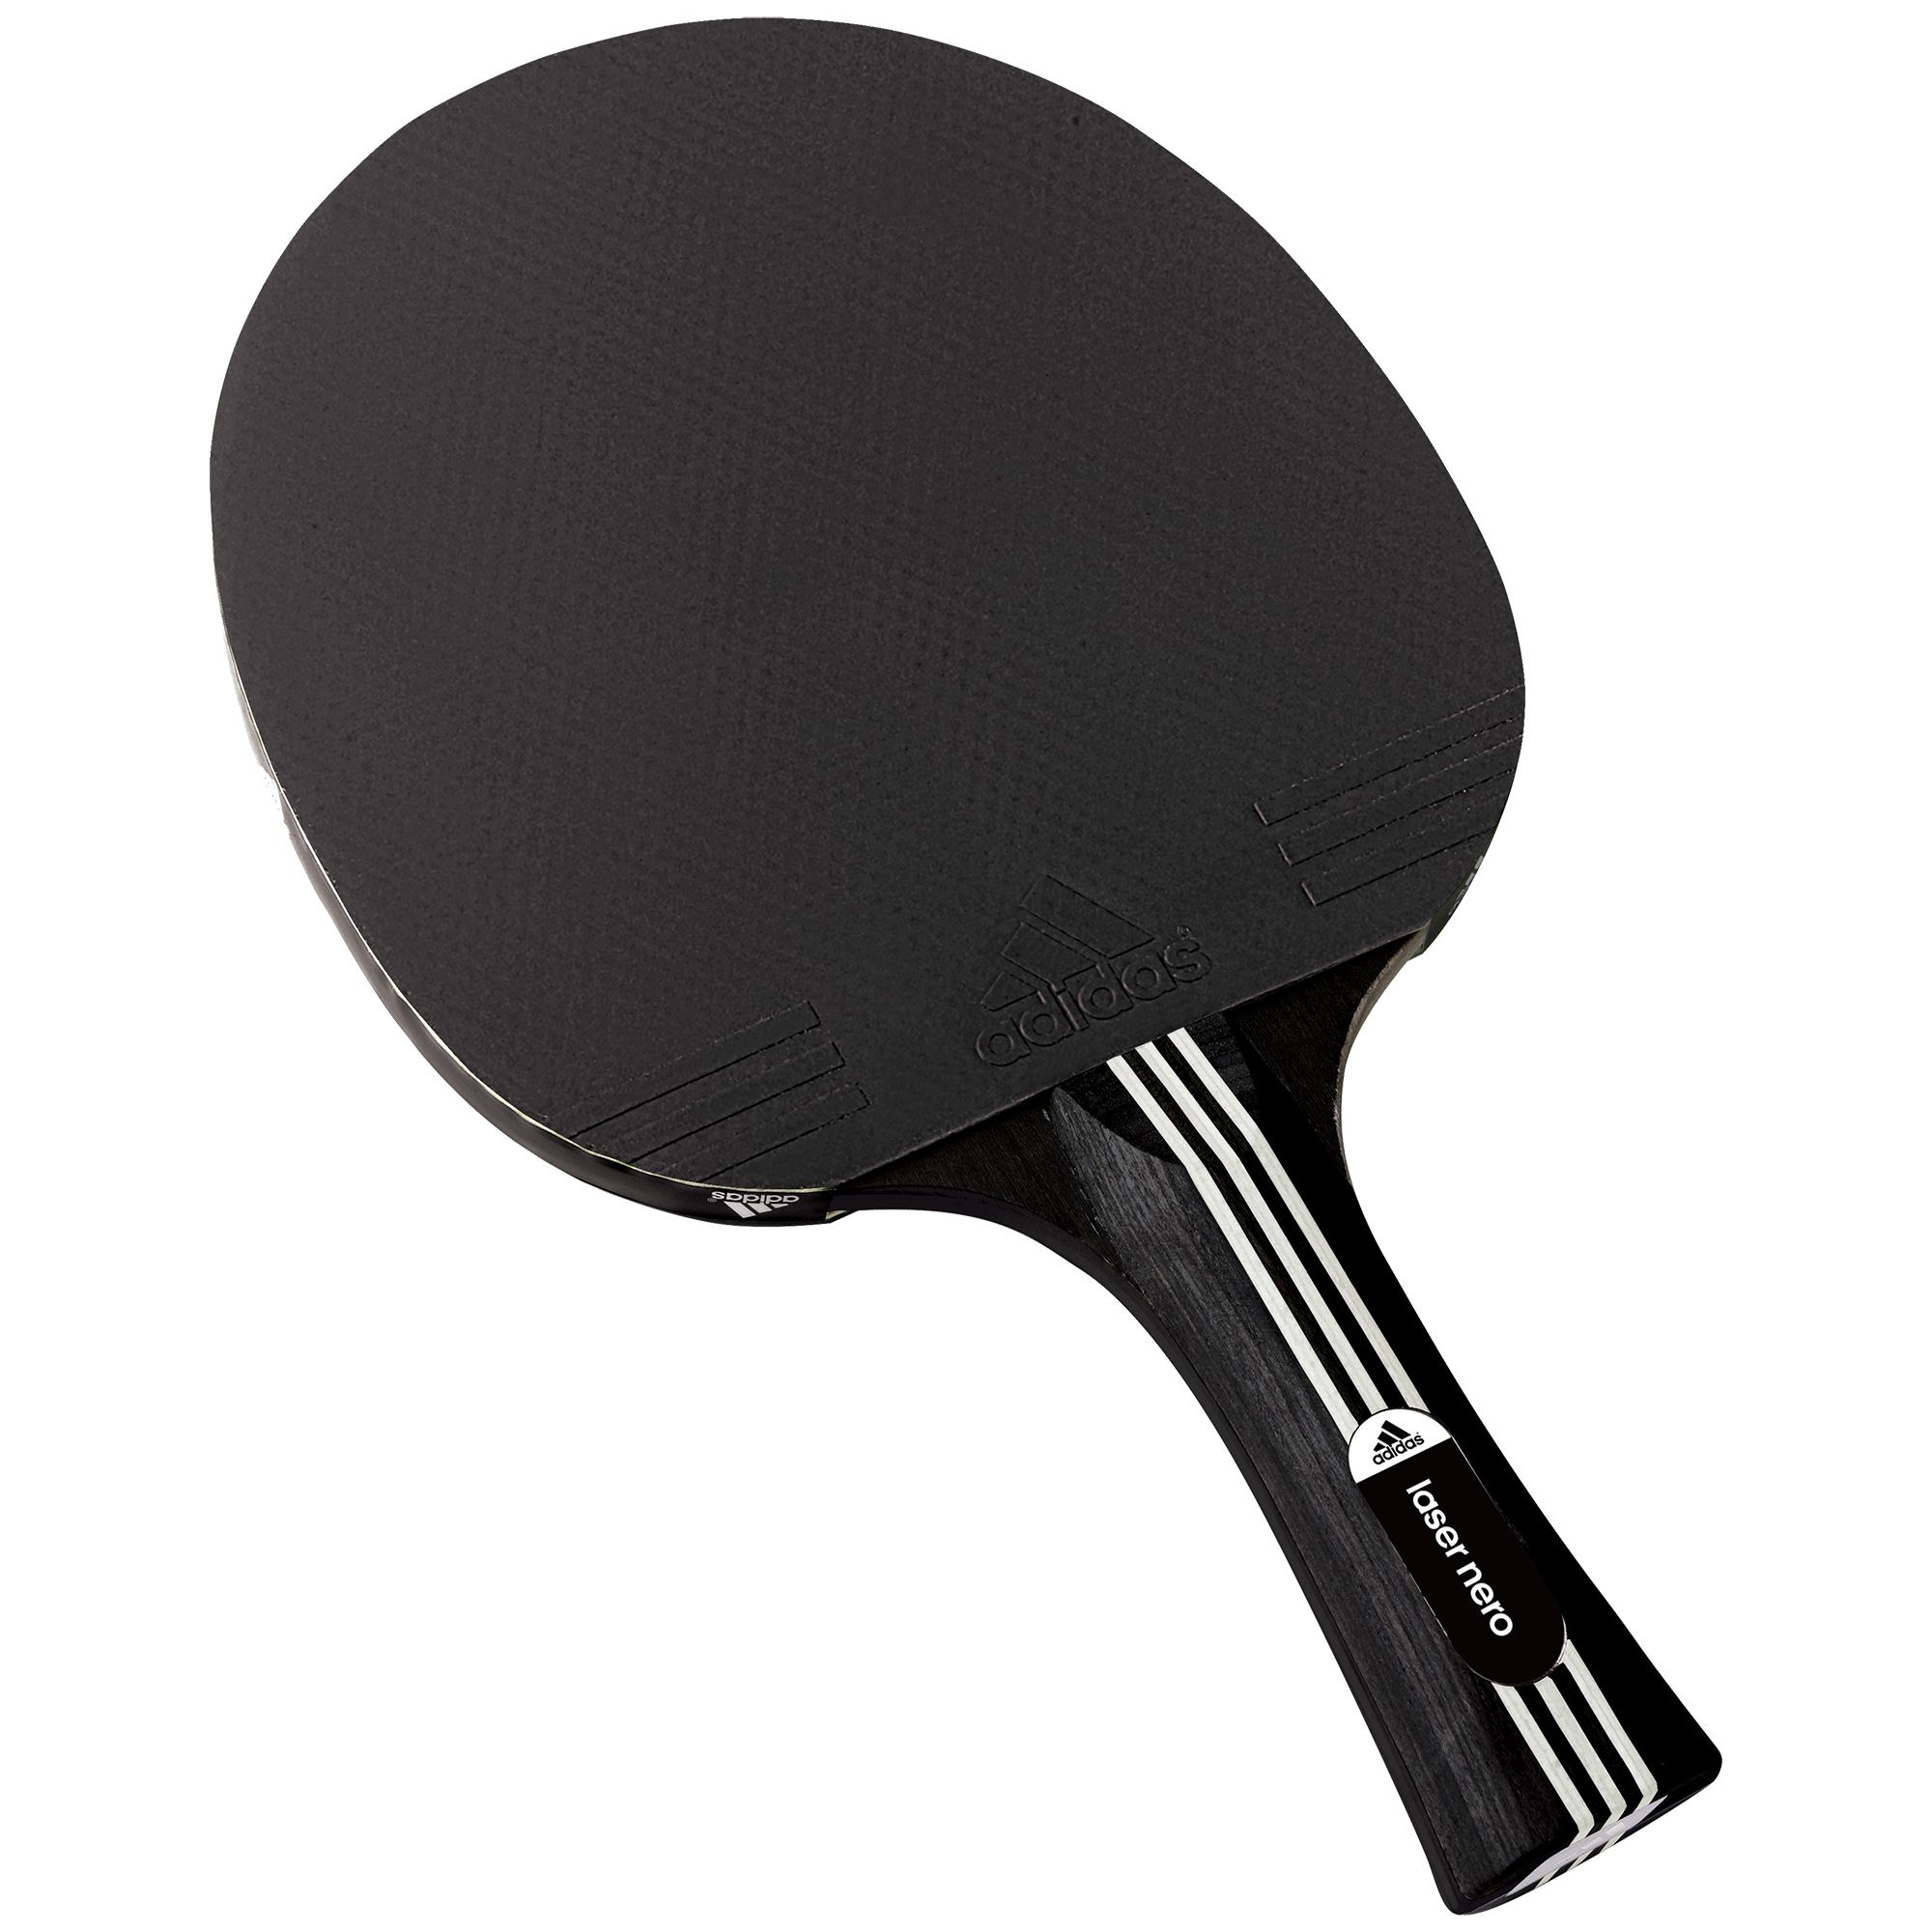 Adidas Laser Nero Table Tennis Bat Sweatband Com